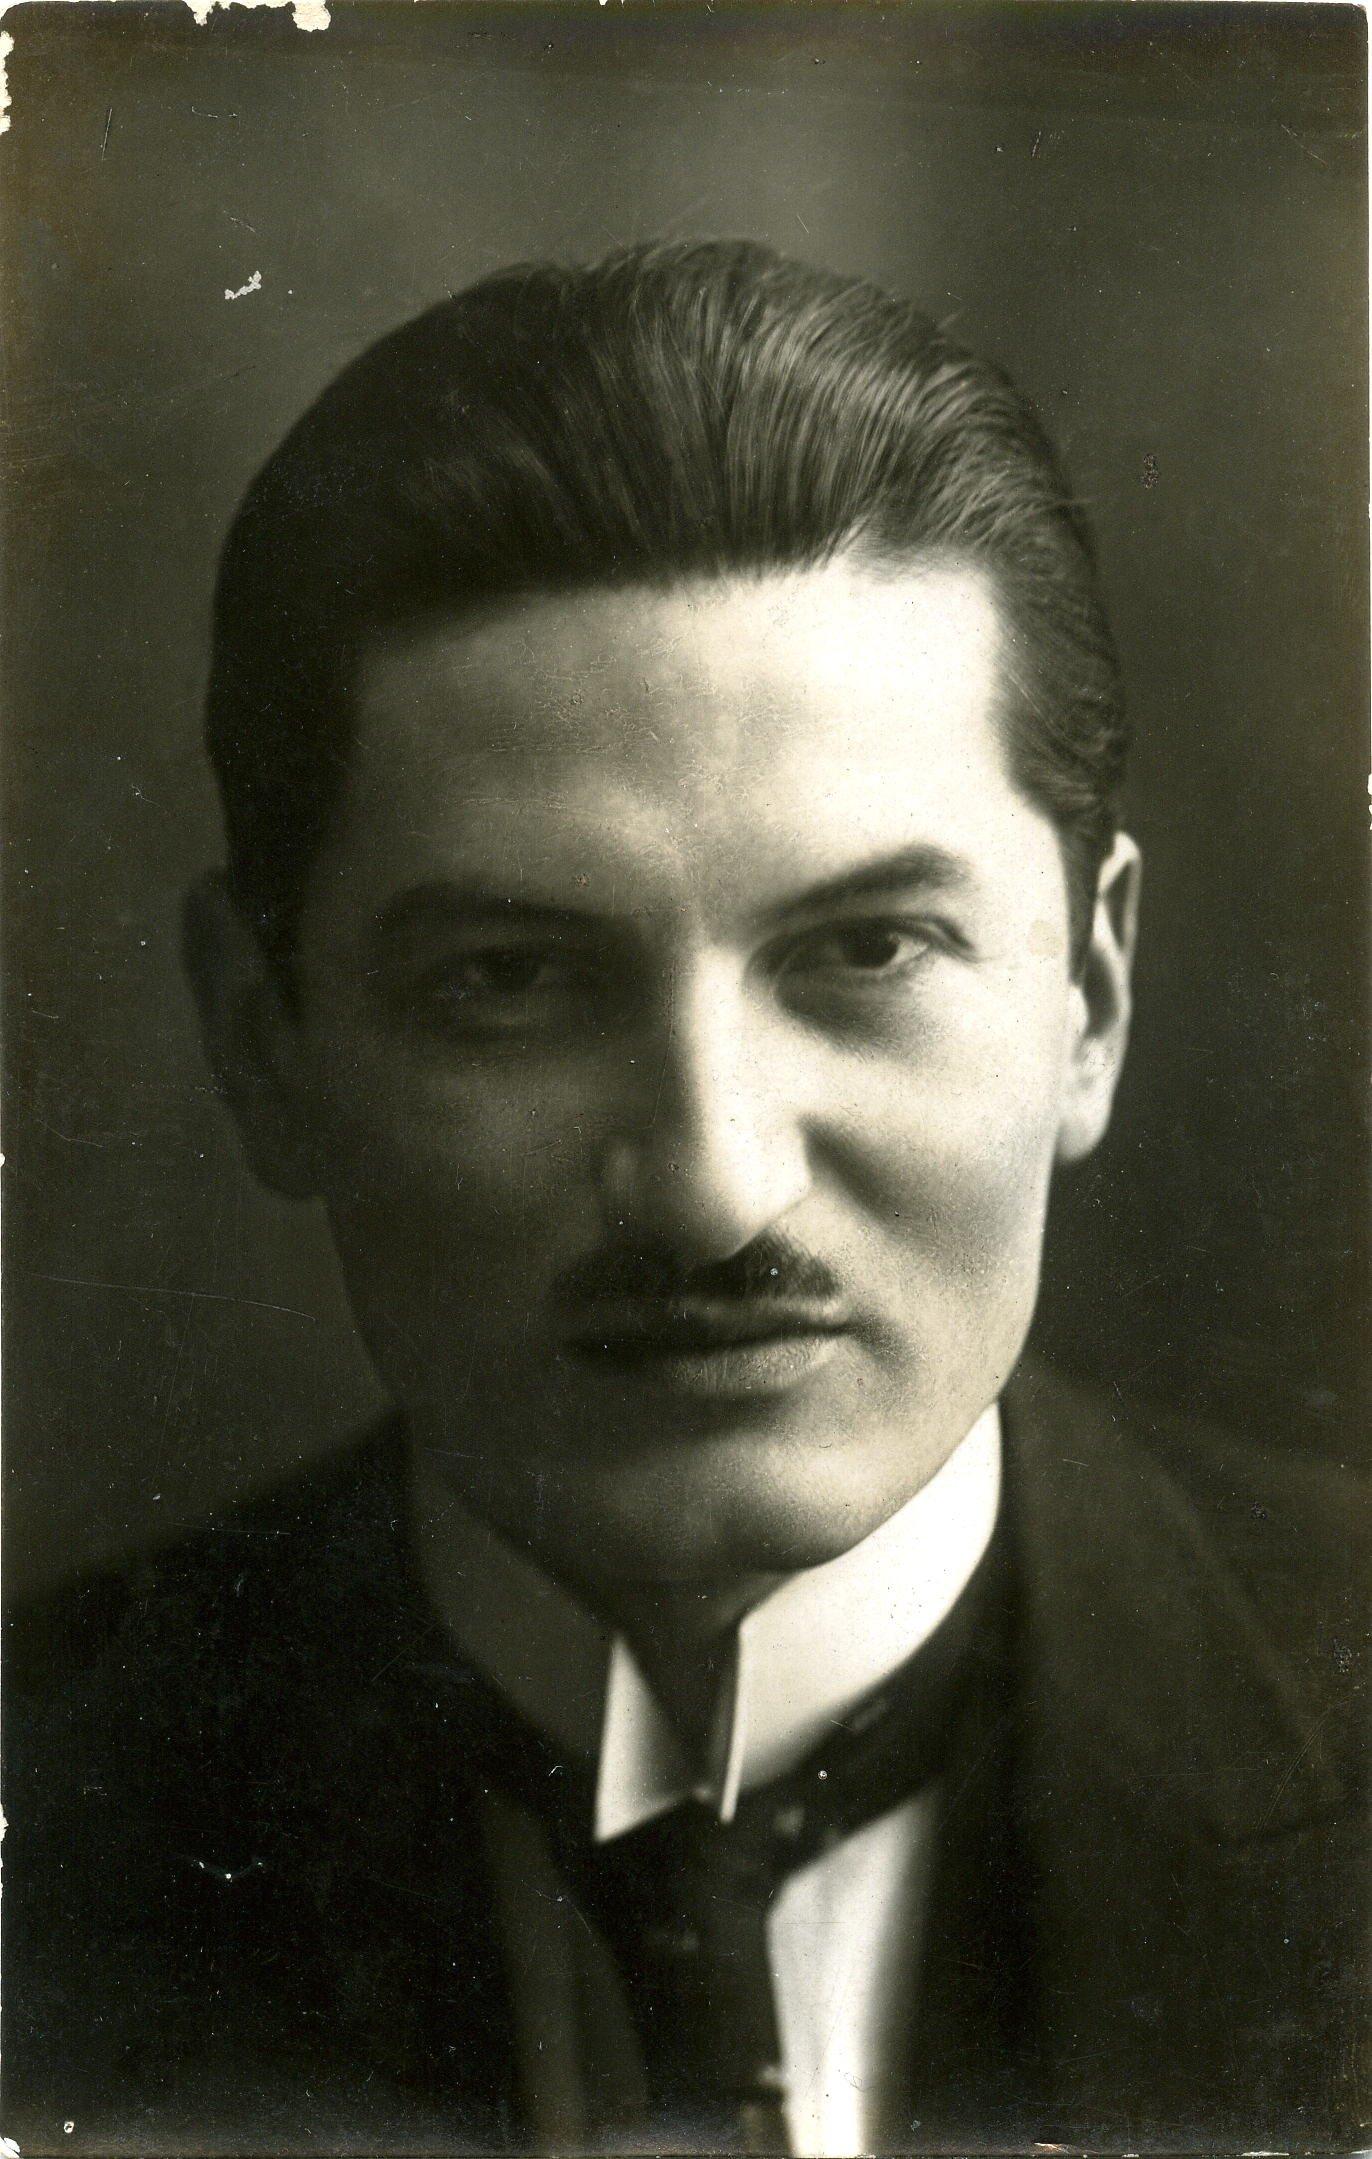 Ismayıl Hakkı Baltacıoğlu became the first university rector of the Turkish republic after he was assigned as the rector of Darülfünun. (Courtesy of Ali Baltacıoğlu)